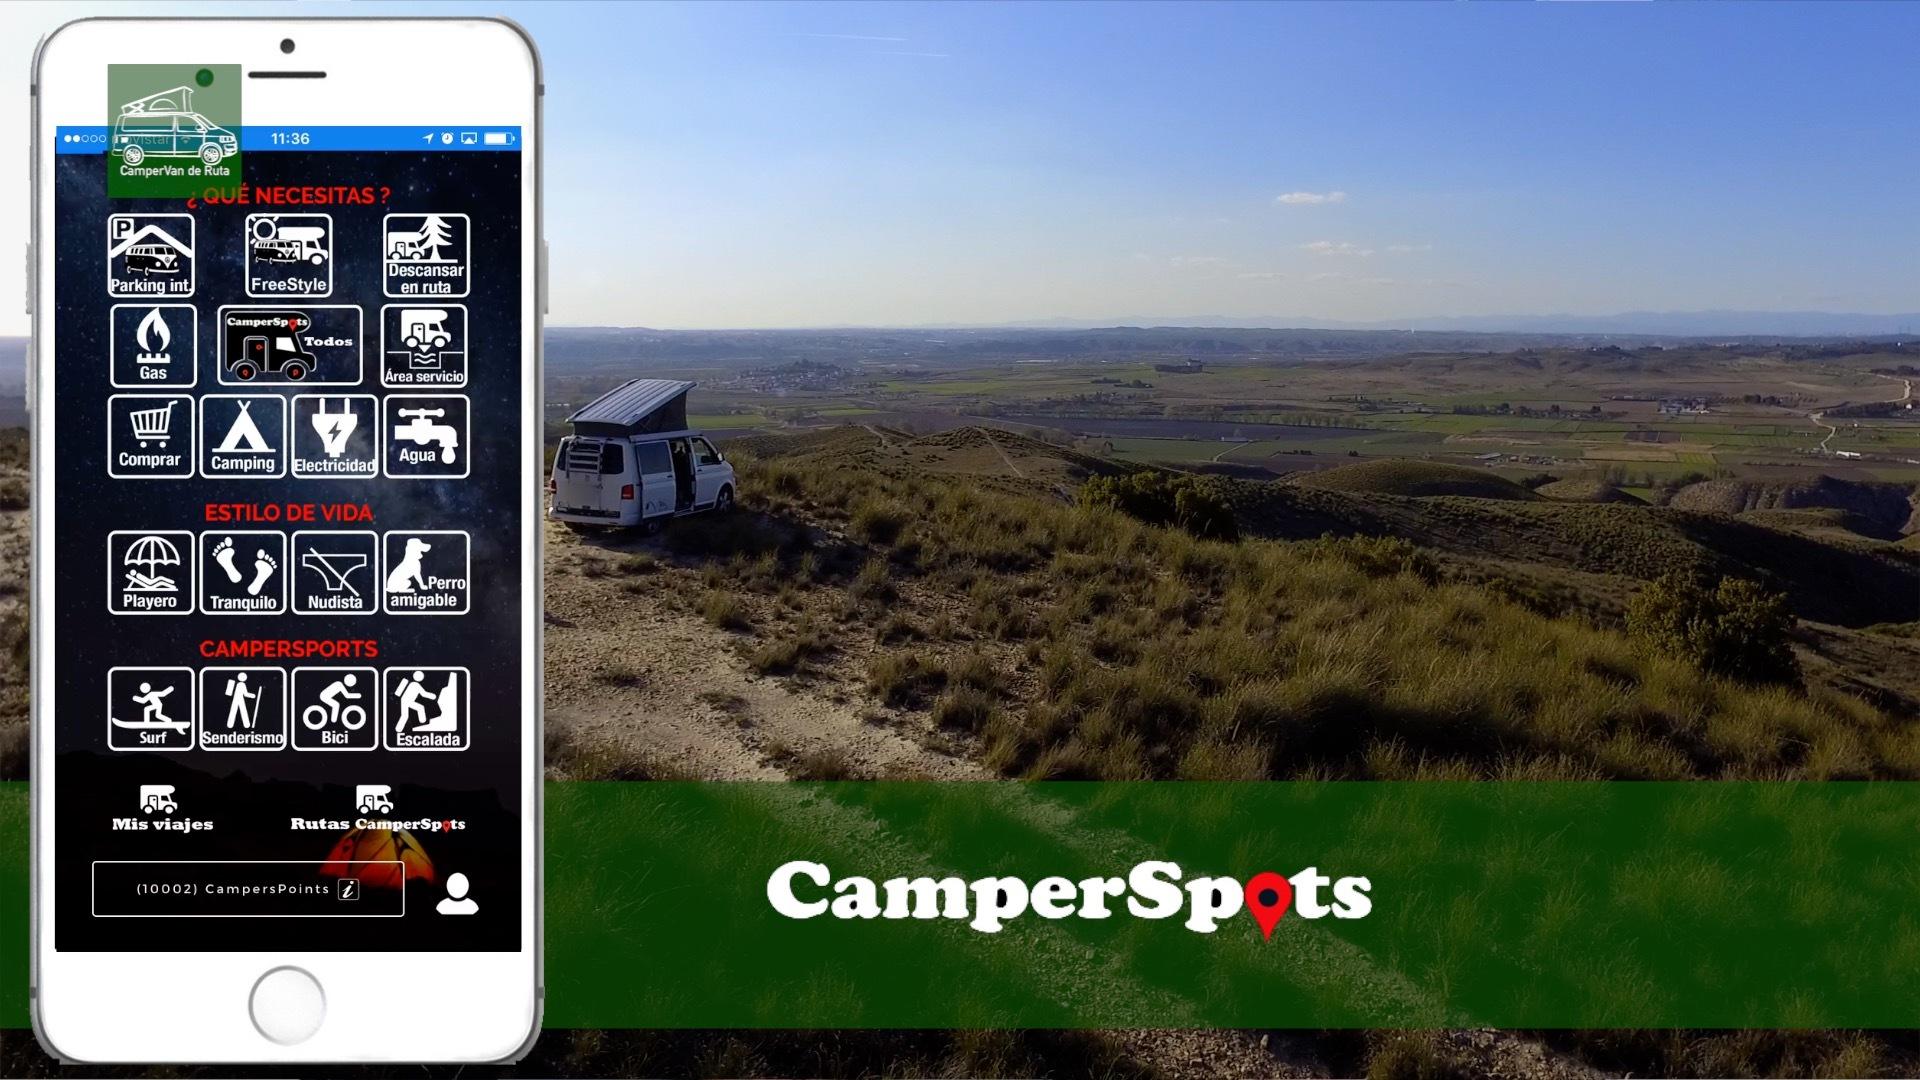 Camperspots, la app definitiva para tu furgo camper o autocaravana